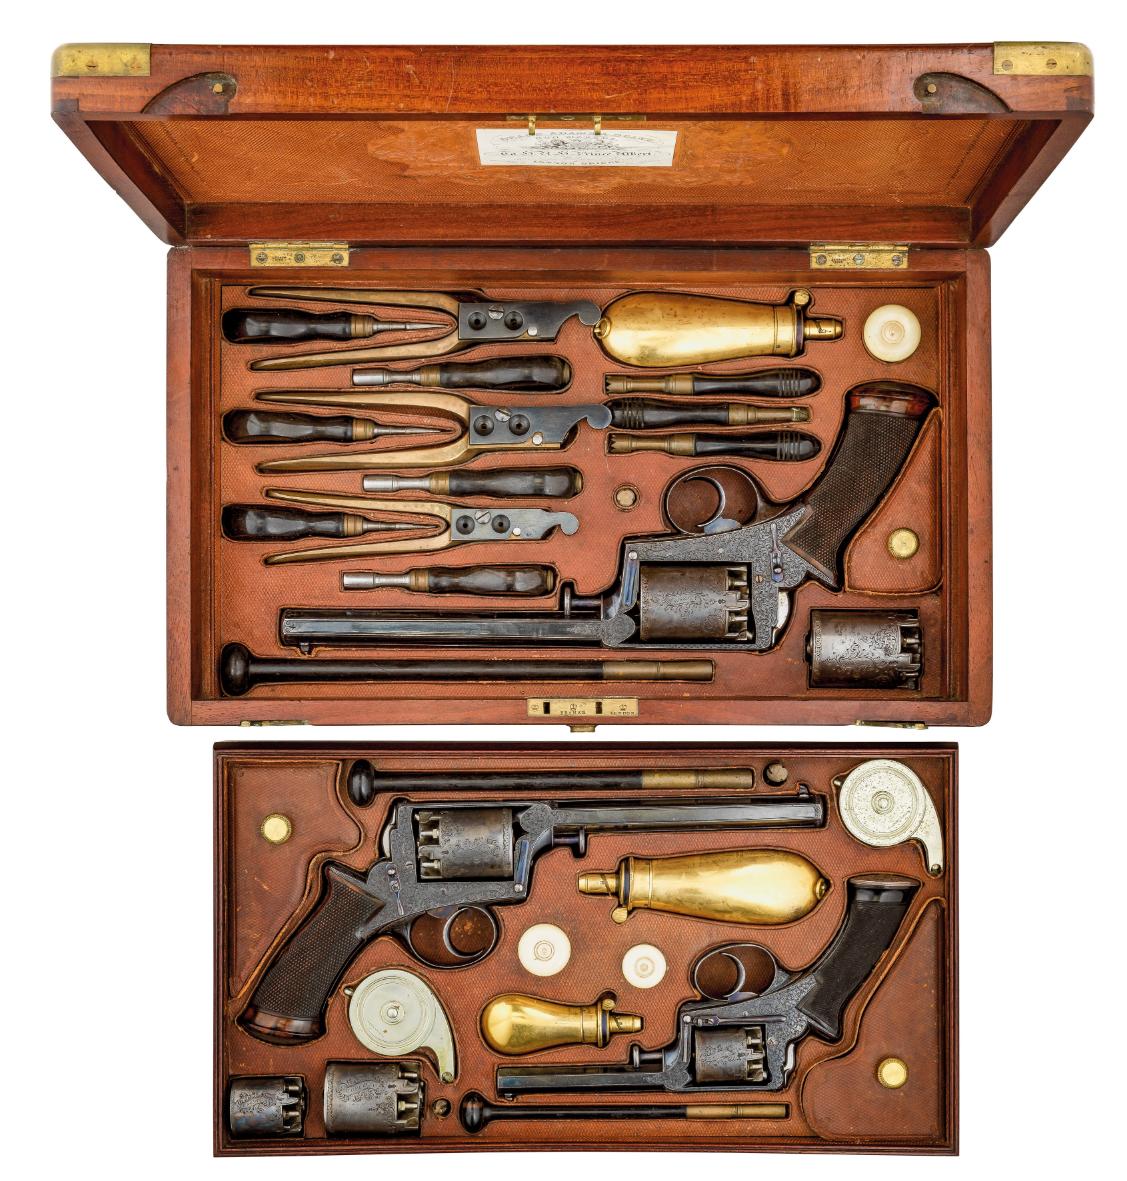 ‡˜Ⓦ AN EXCEPTIONAL CASED SET OF 38 BORE^ 54 BORE AND 120 BORE ADAMS PATENT 1851 MODEL SELF-COCKI